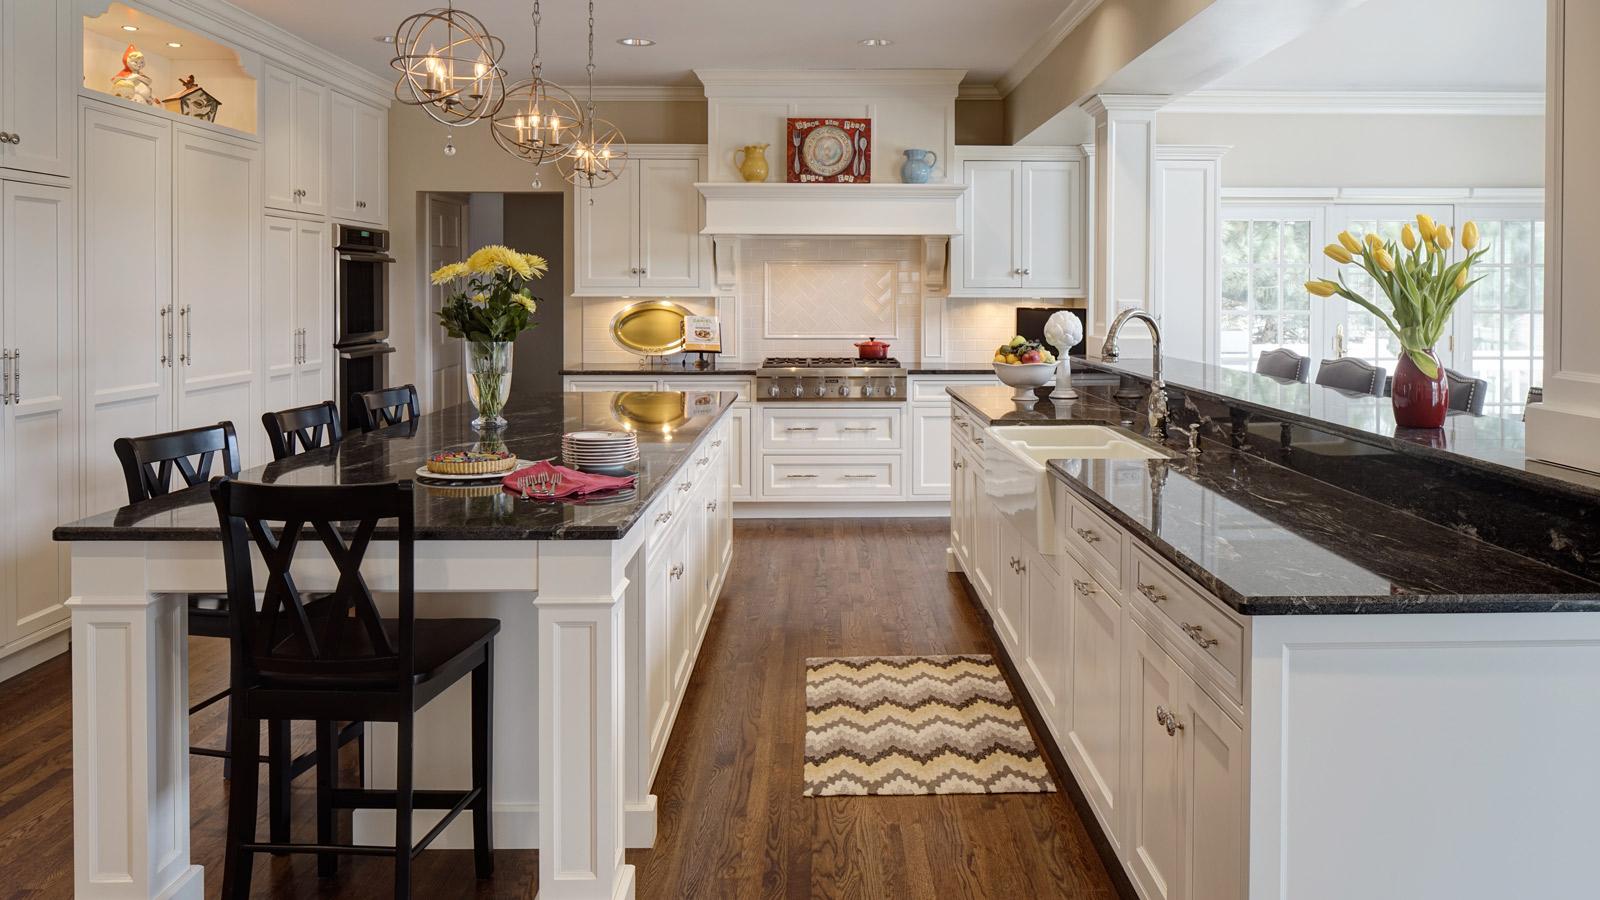 1600 x 900 Fresh and Airy Kitchen Design Barrington drury desing